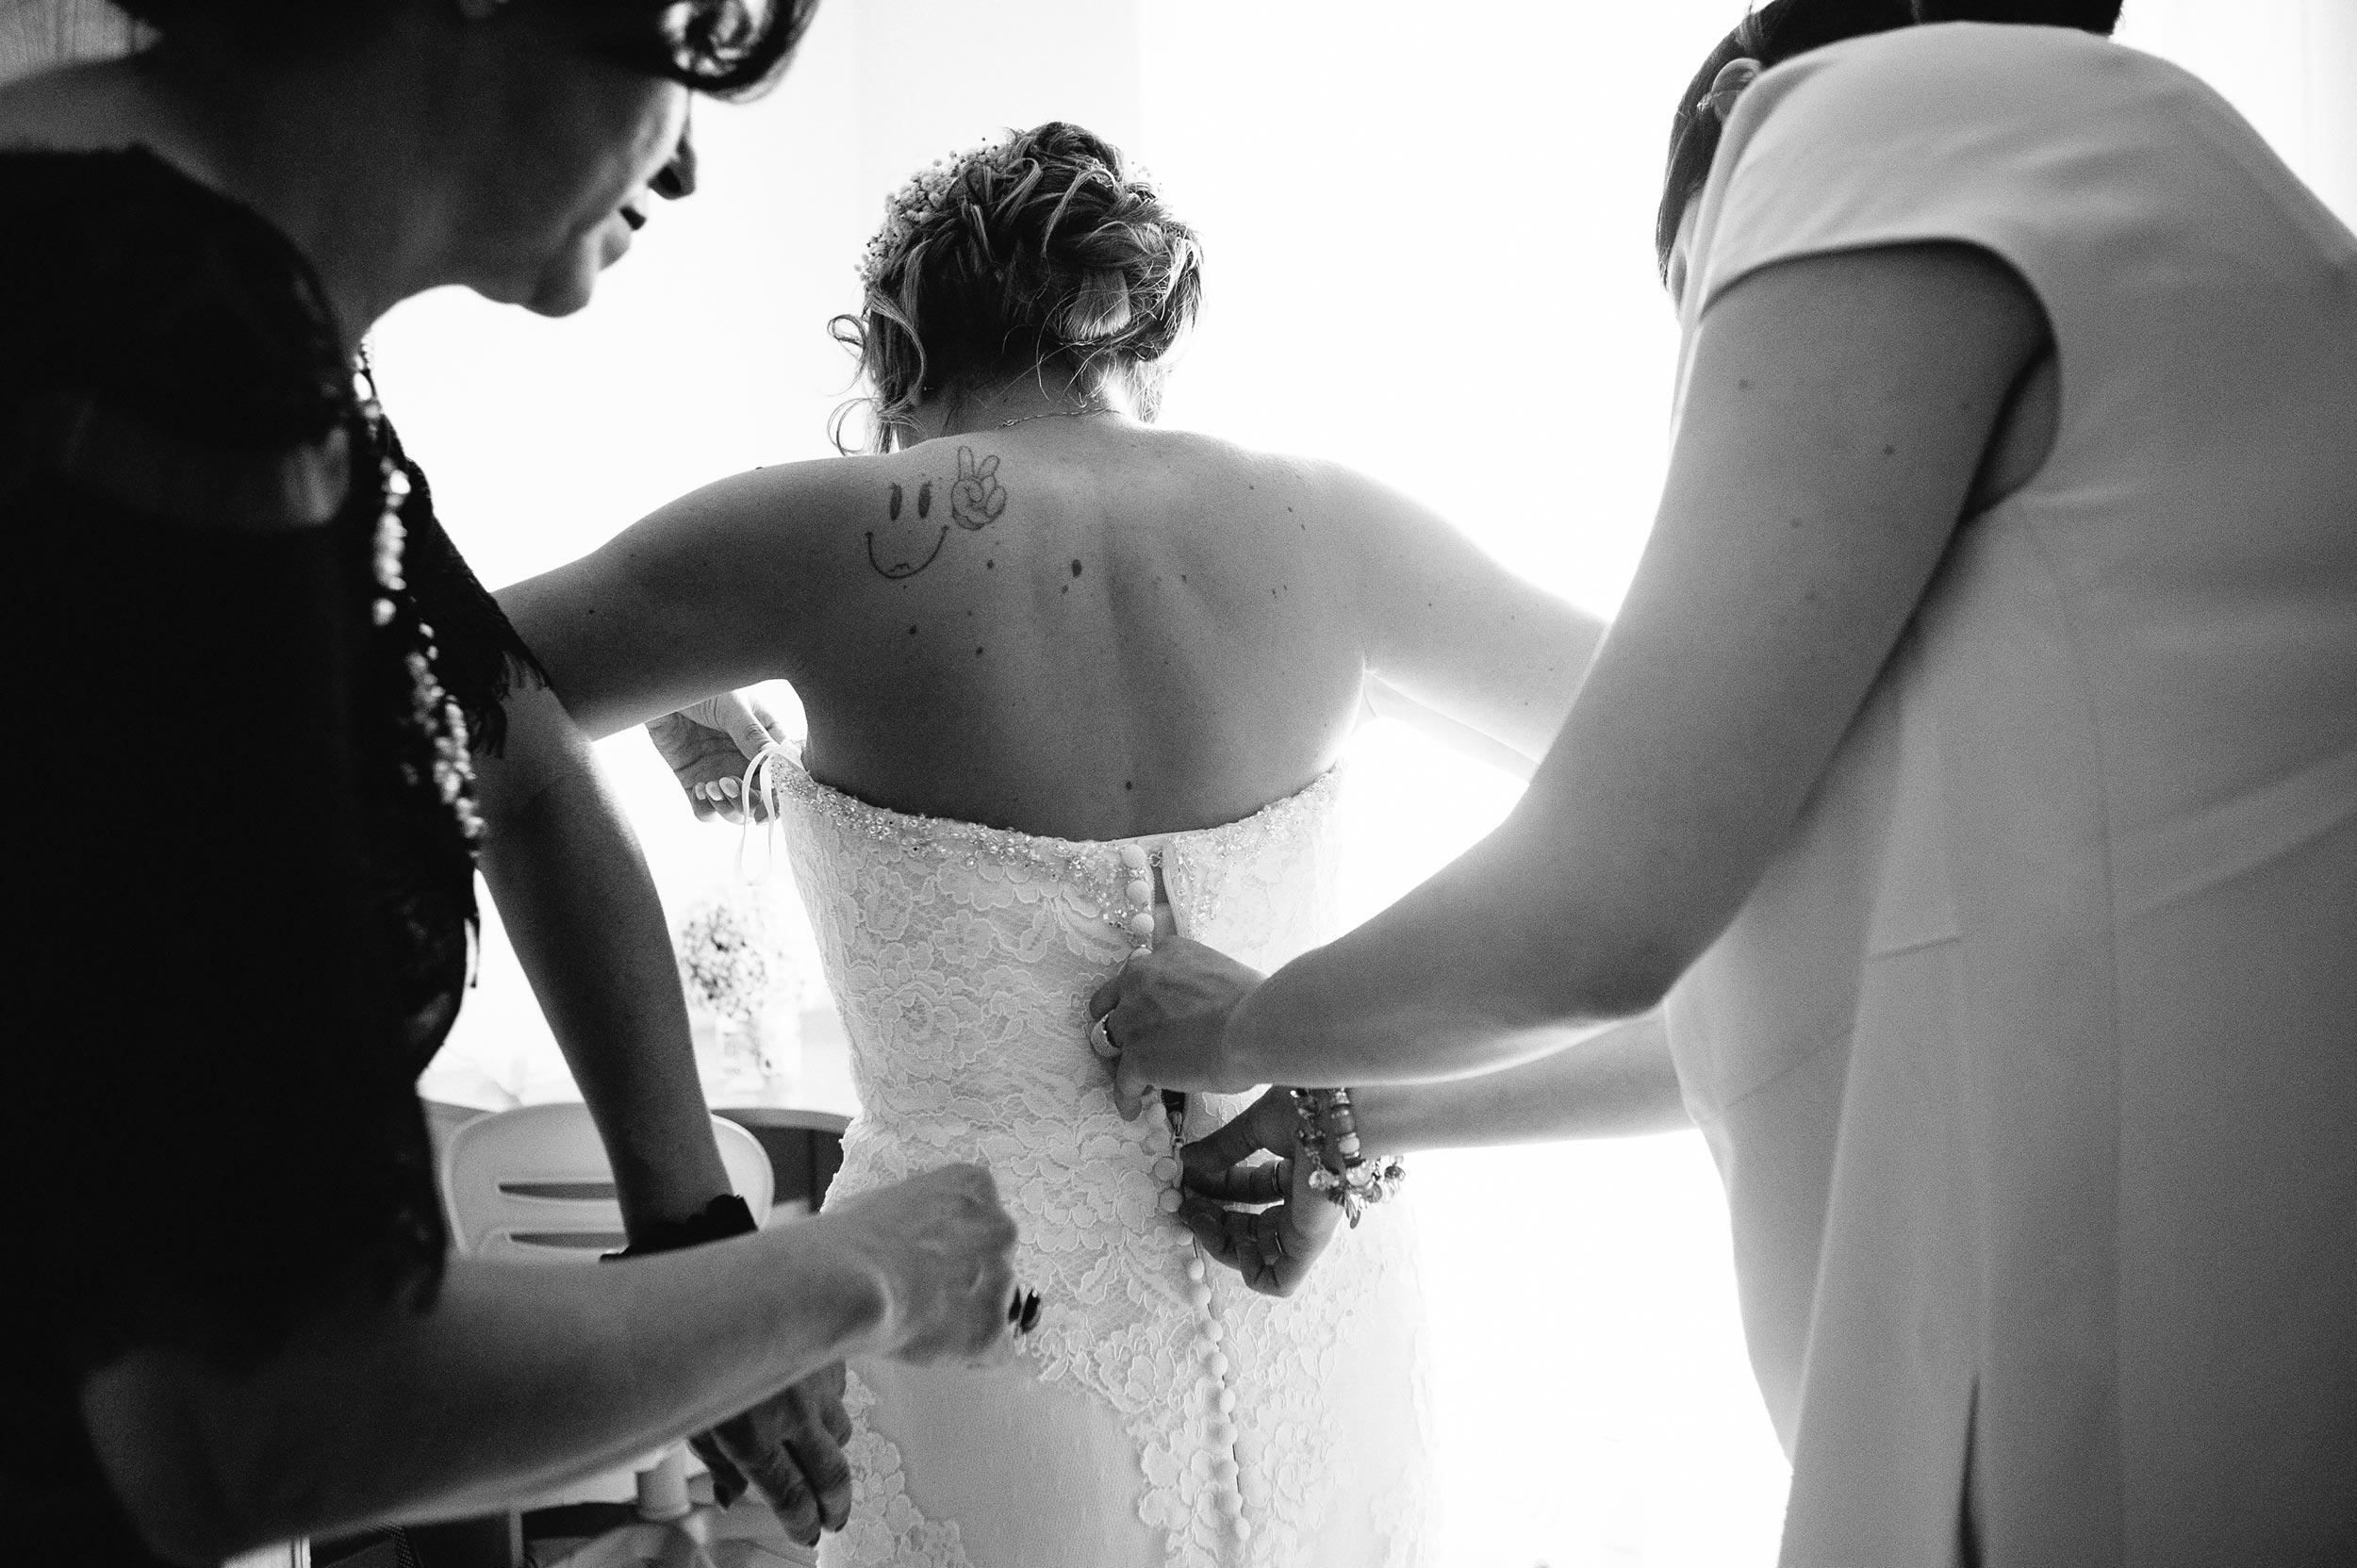 2016-Claudio-Teresa-Naples-Wedding-Photographer-Italy-Alessandro-Avenali-25.jpg